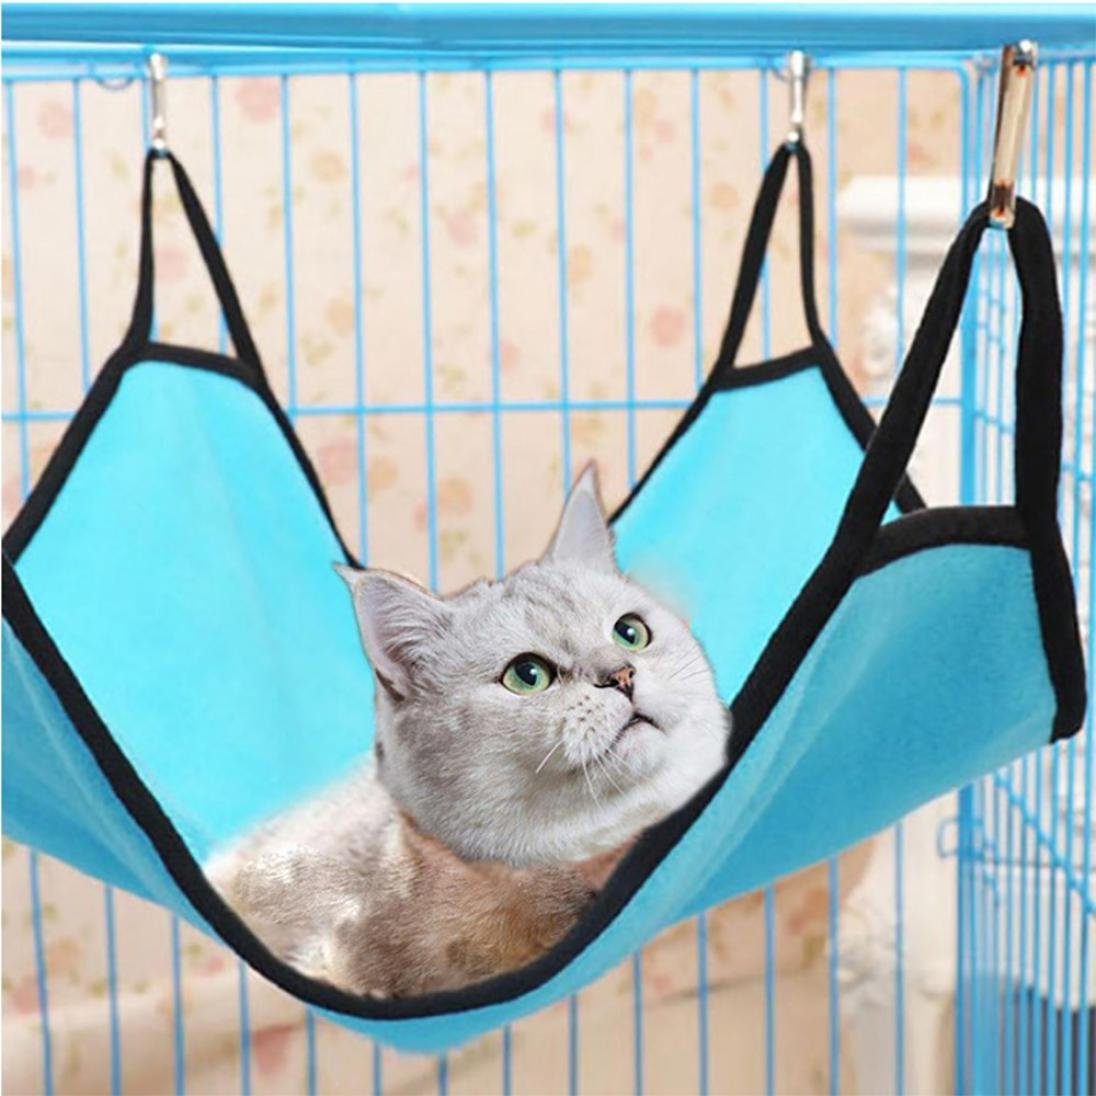 Iusun Cat Hammocks, Pet Hammock, Cute Pet Cat Kitten Animal Hammock Sleep Bed Bunk Sleep Pad Hanging Pet Cage (Blue)